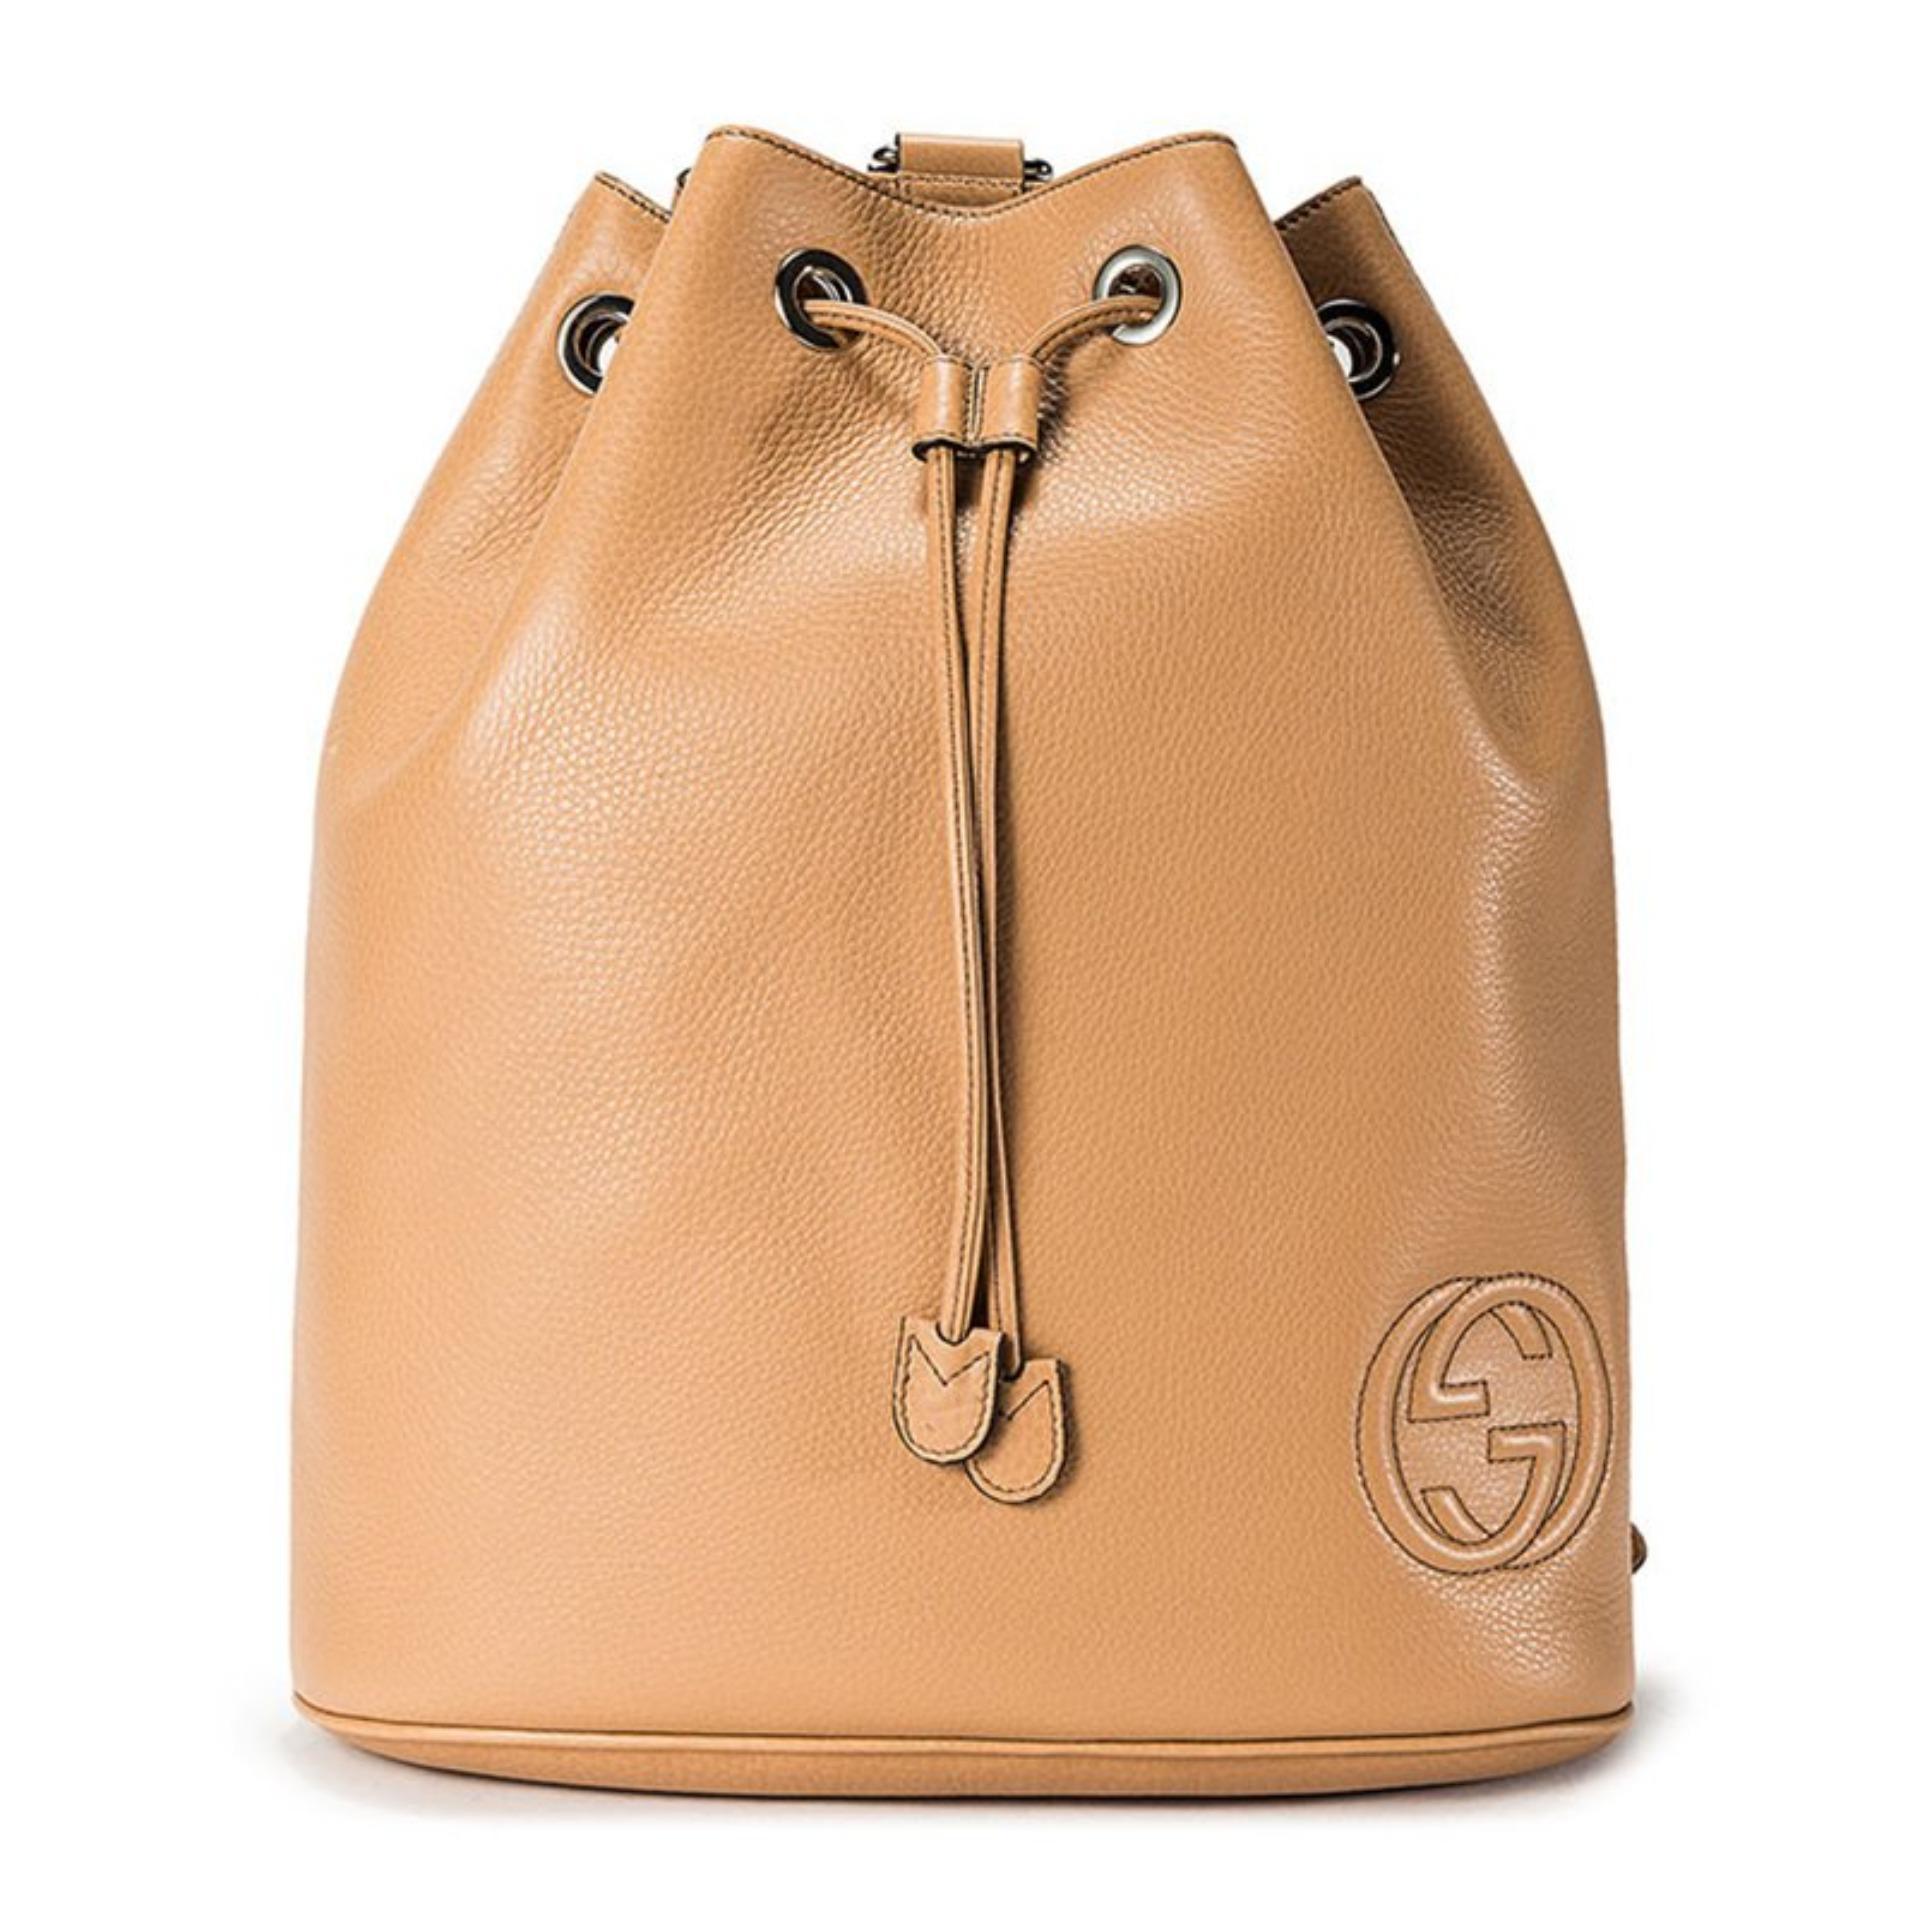 b7e0e7f176f3 Gucci Soho Leather Drawstring Backpack (Rose Beige)   368588A7M0N2754